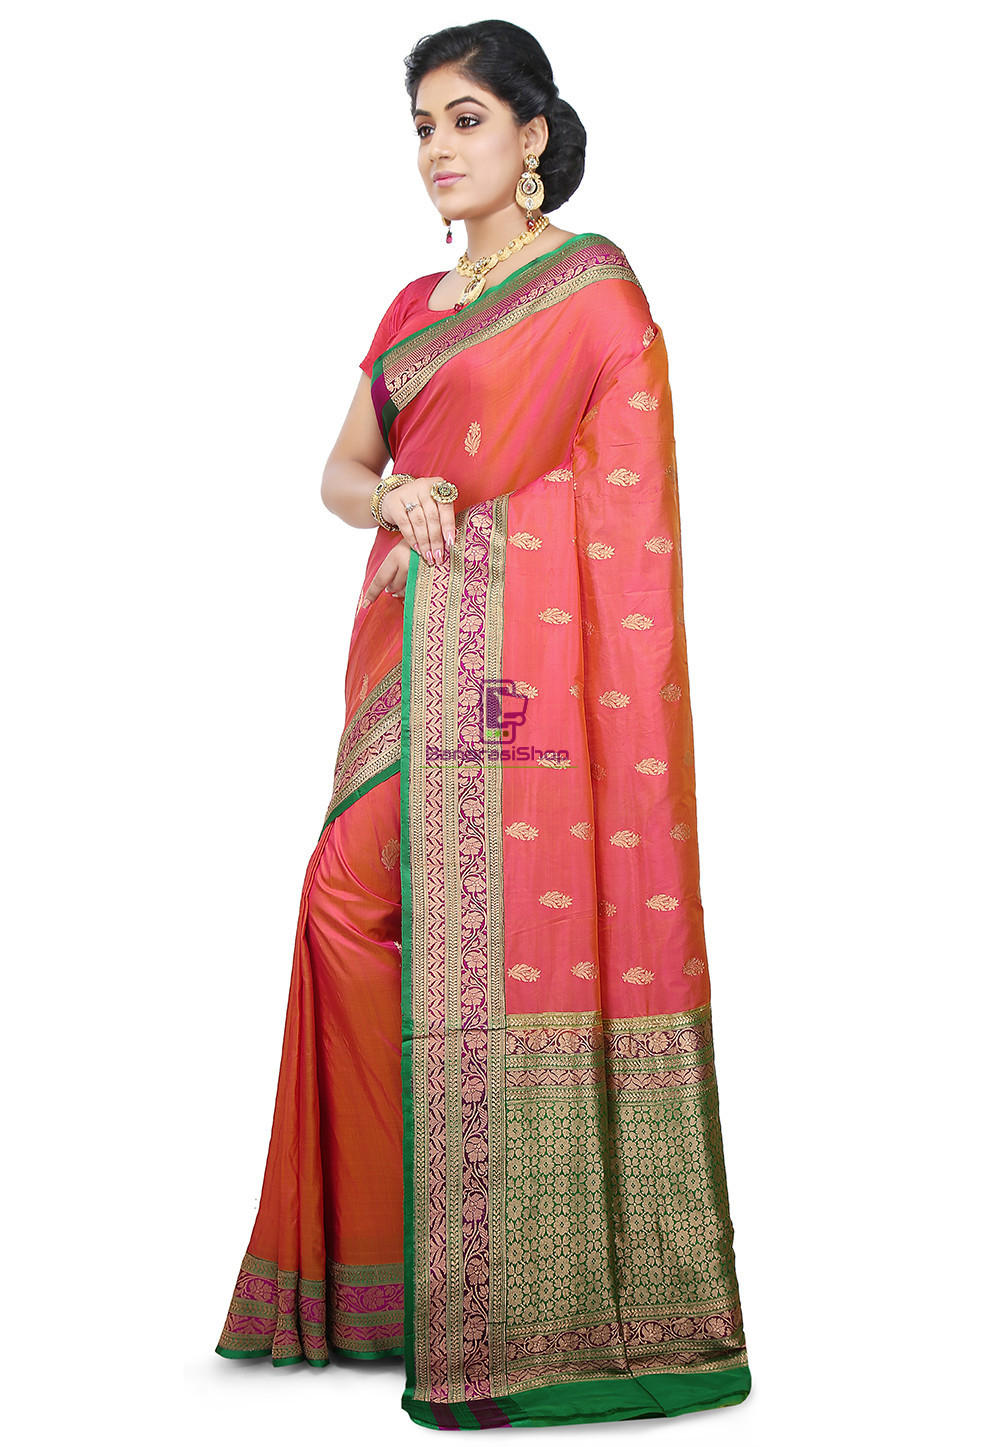 Banarasi Pure Katan Silk Handloom Saree in Coral Pink 4